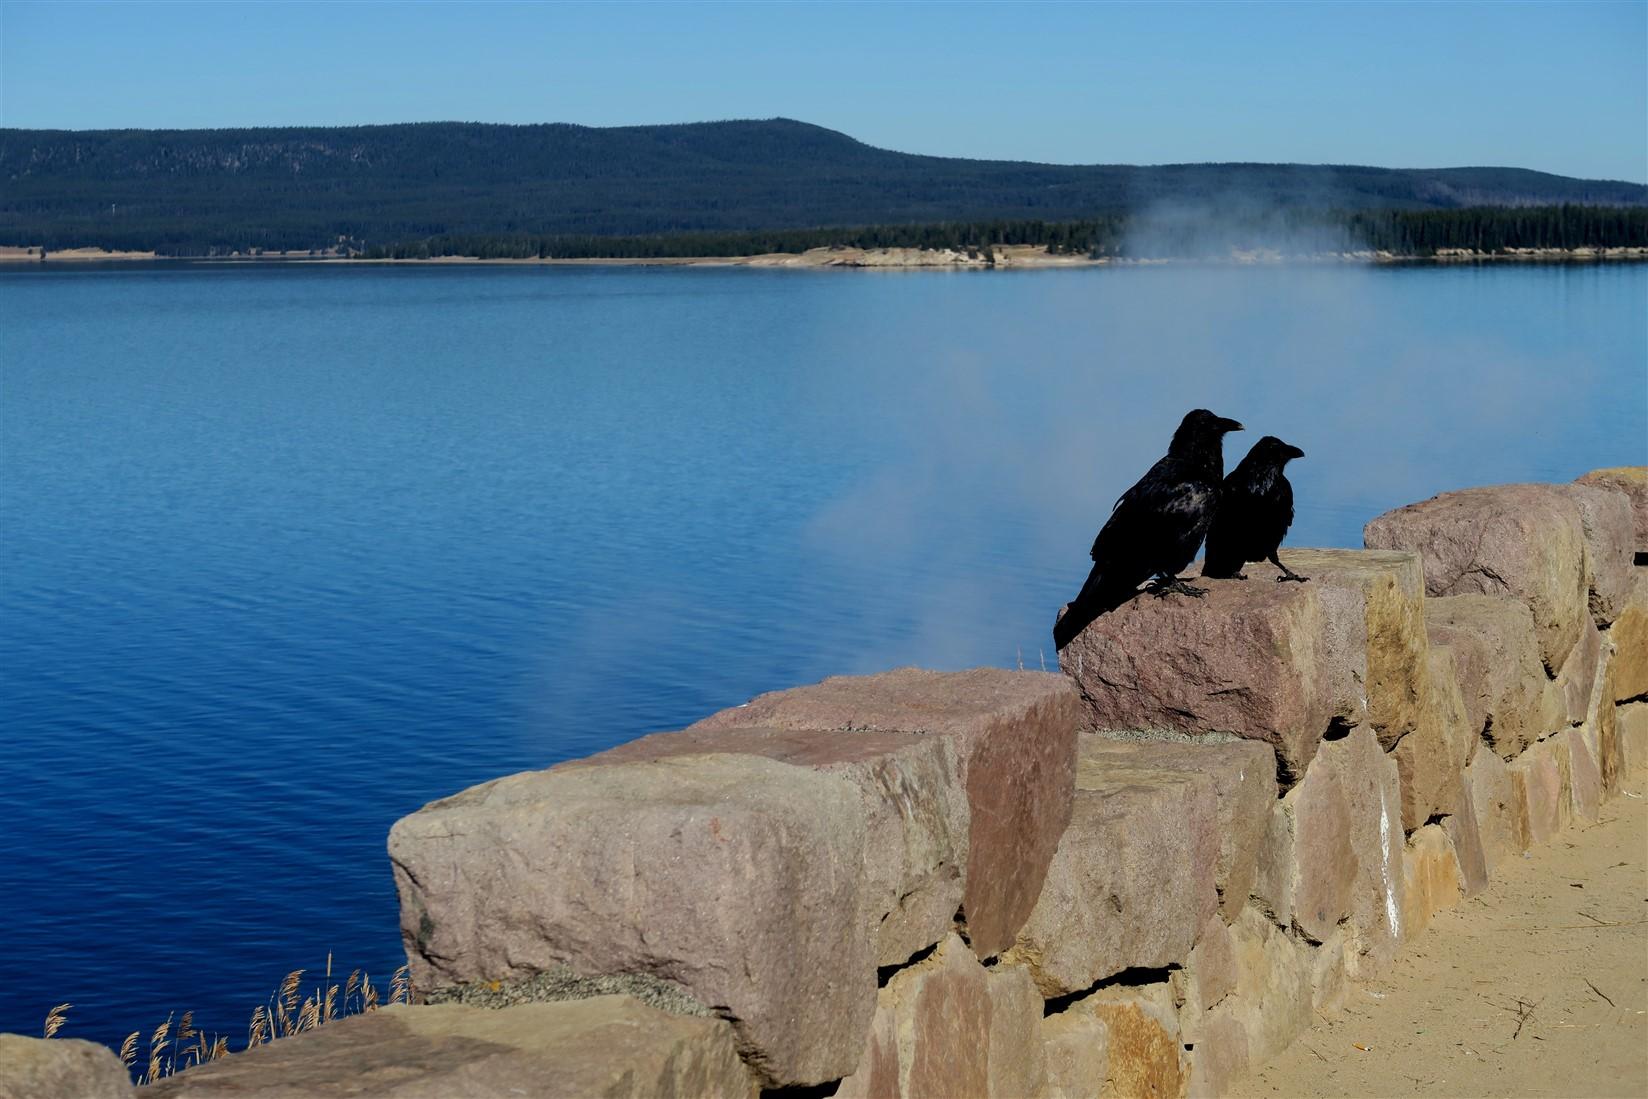 2015 09 11 35 Yellowstone National Park WY.jpg